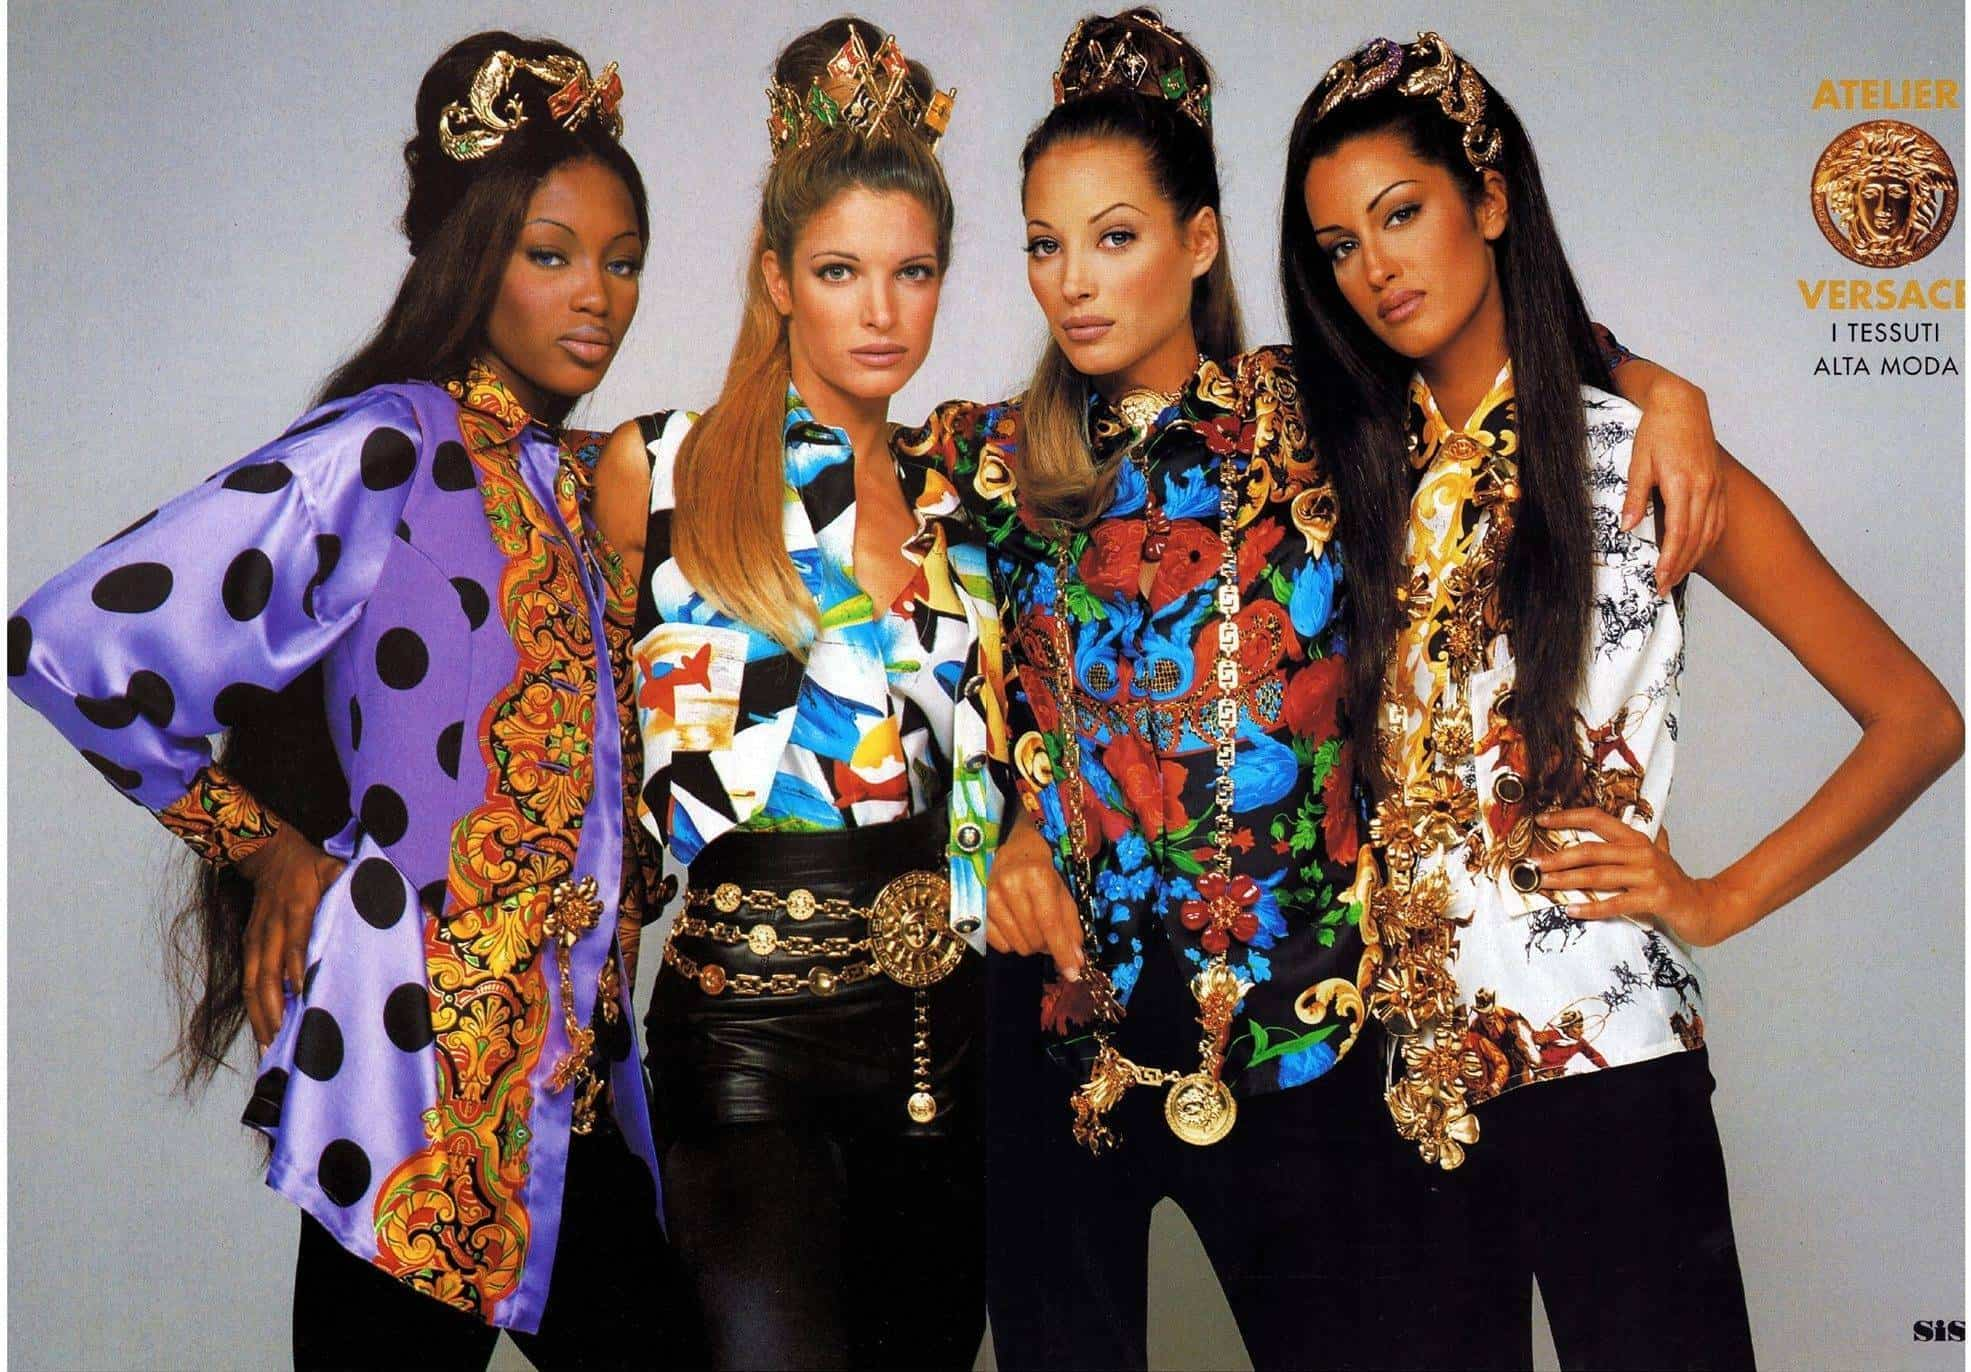 Versace - Iconic Luxury